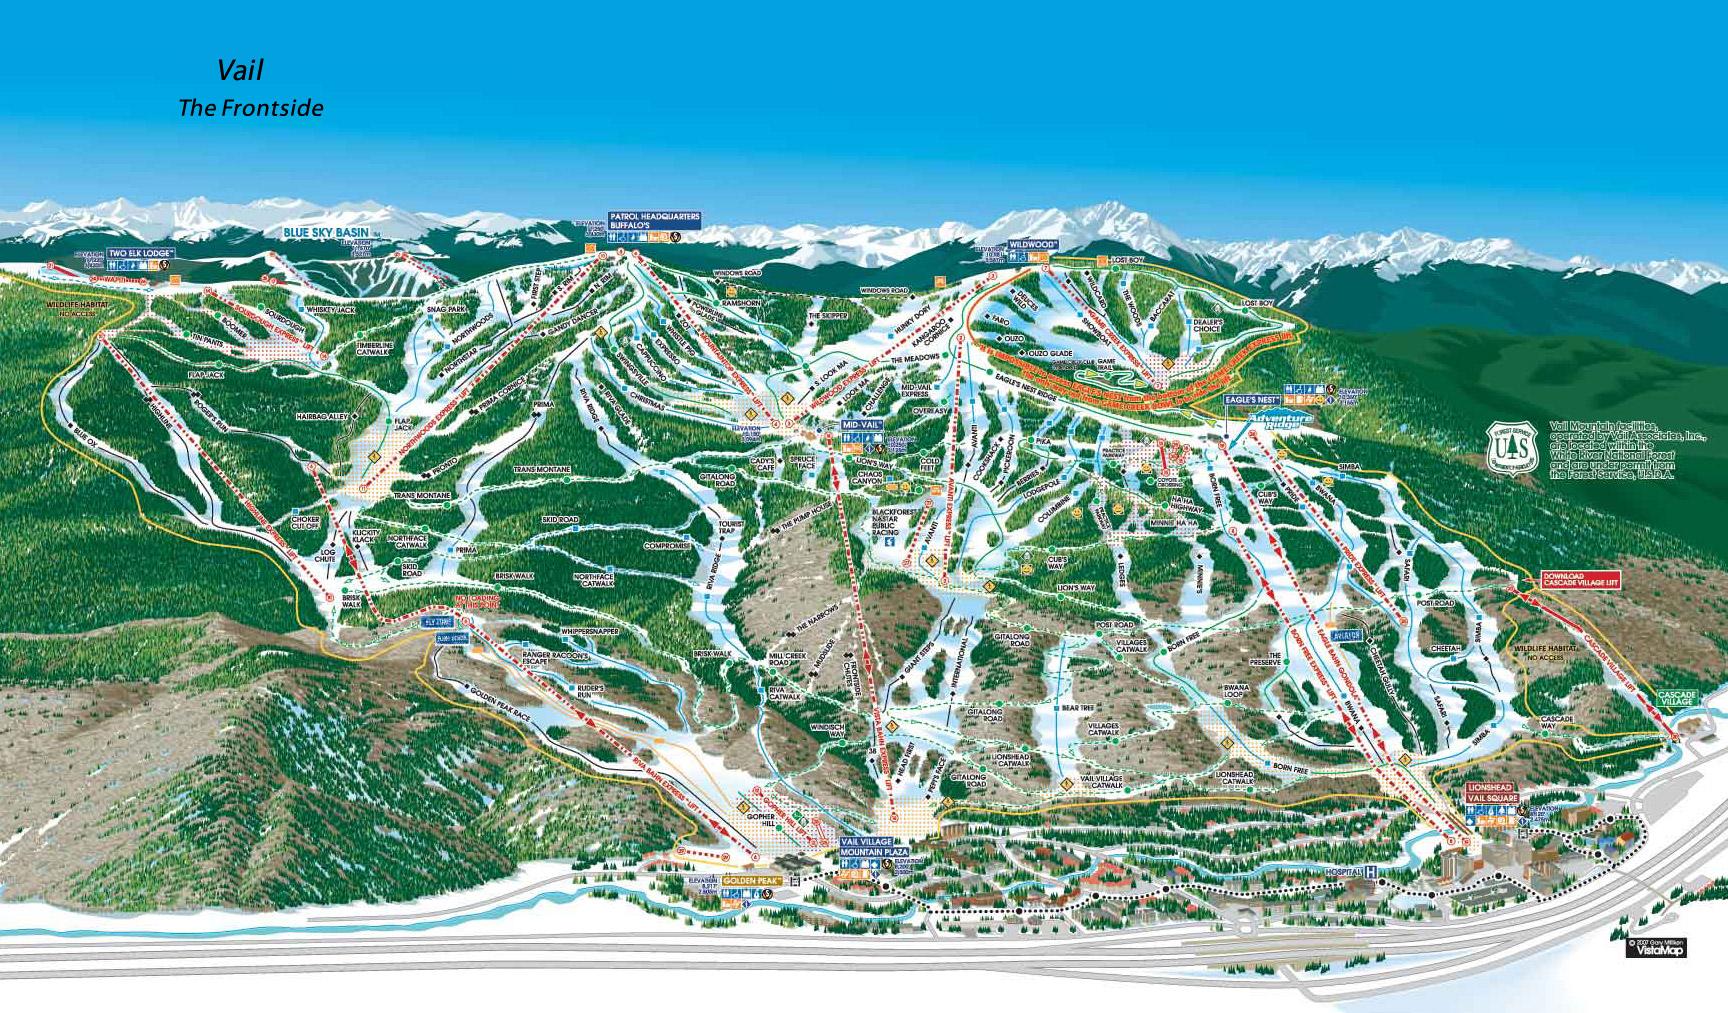 vail trail map. vail co trail mapwebcams